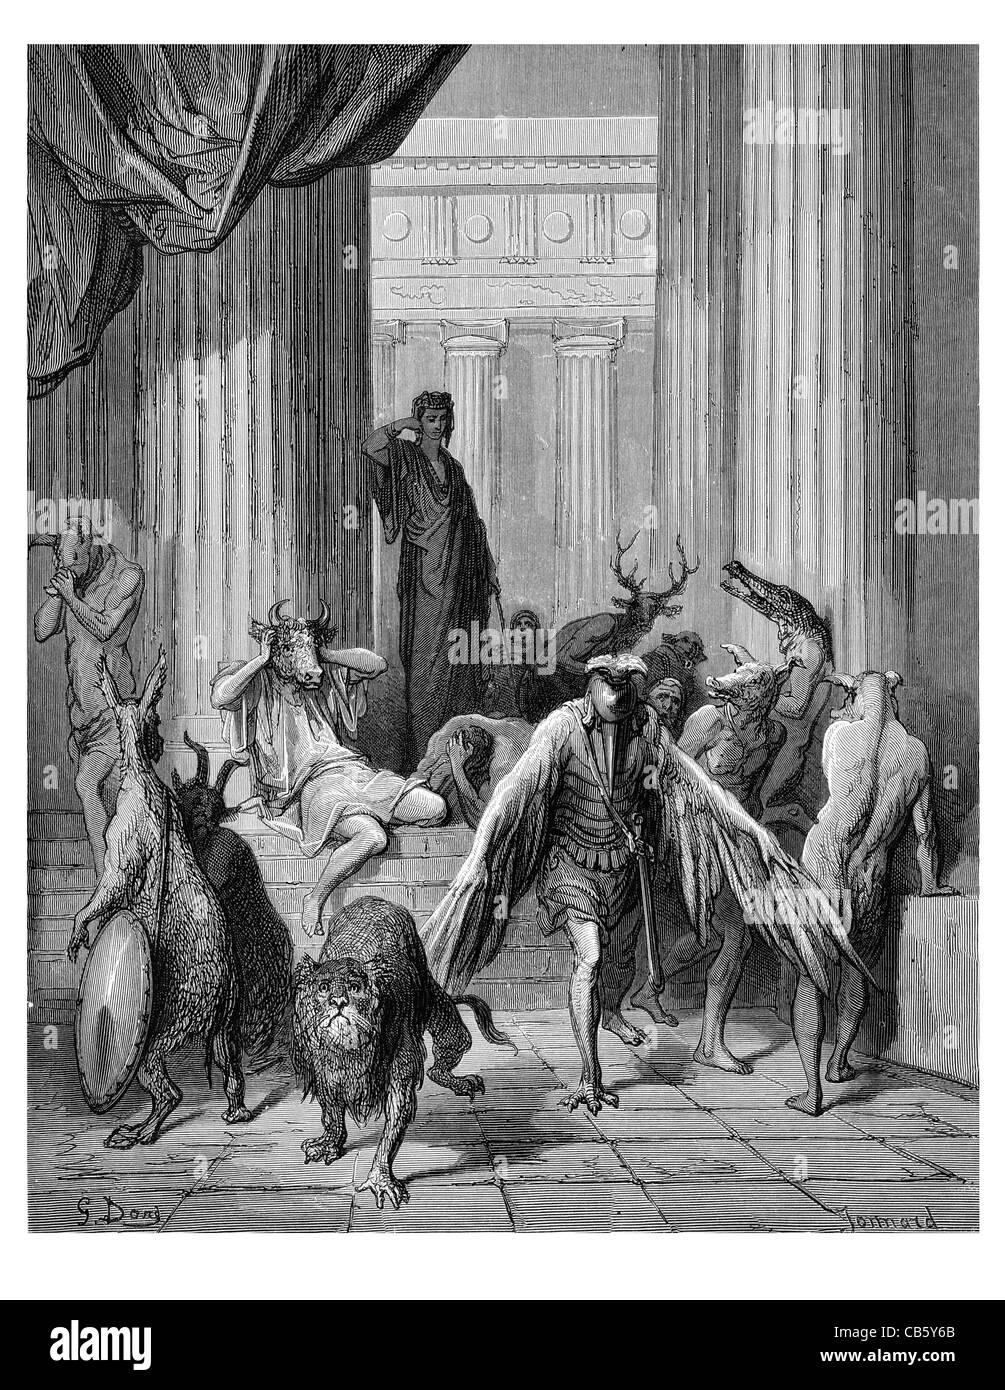 companions of Ulysses Greek mythology mythical monster Minatour beast ancient bull eagle crocodile antler lion fawn - Stock Image